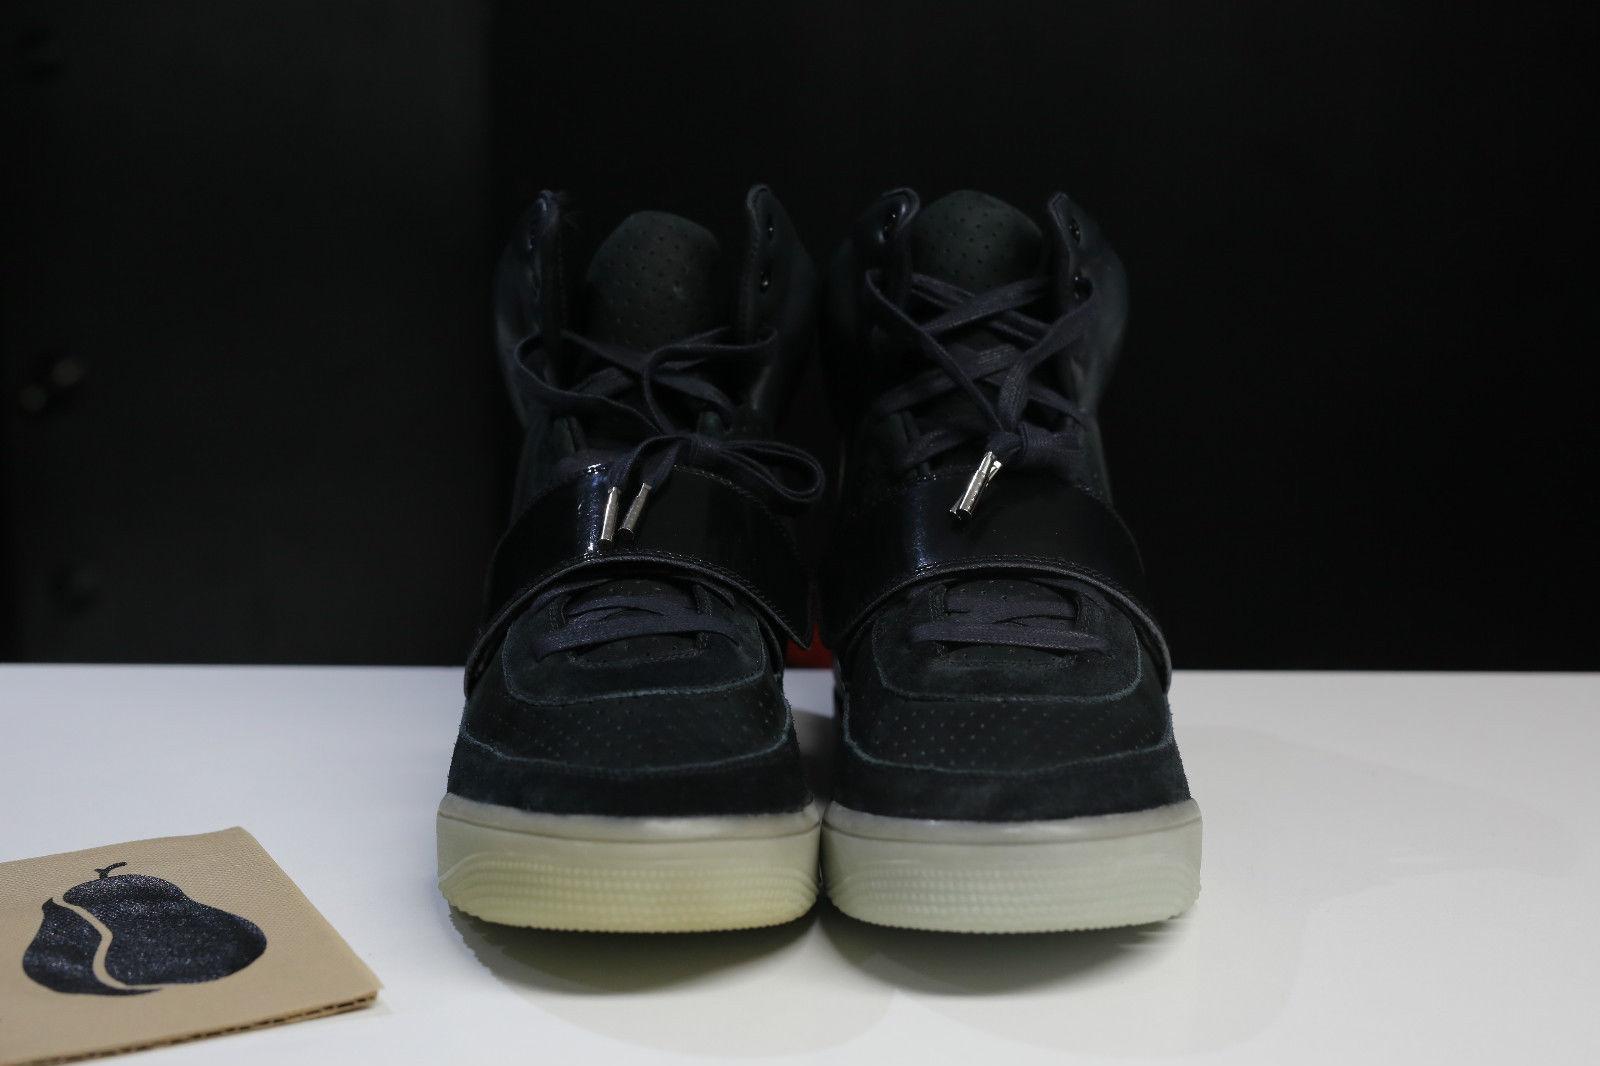 Nike Air Yeezy Kanye West Black/White Sample Pair Toe